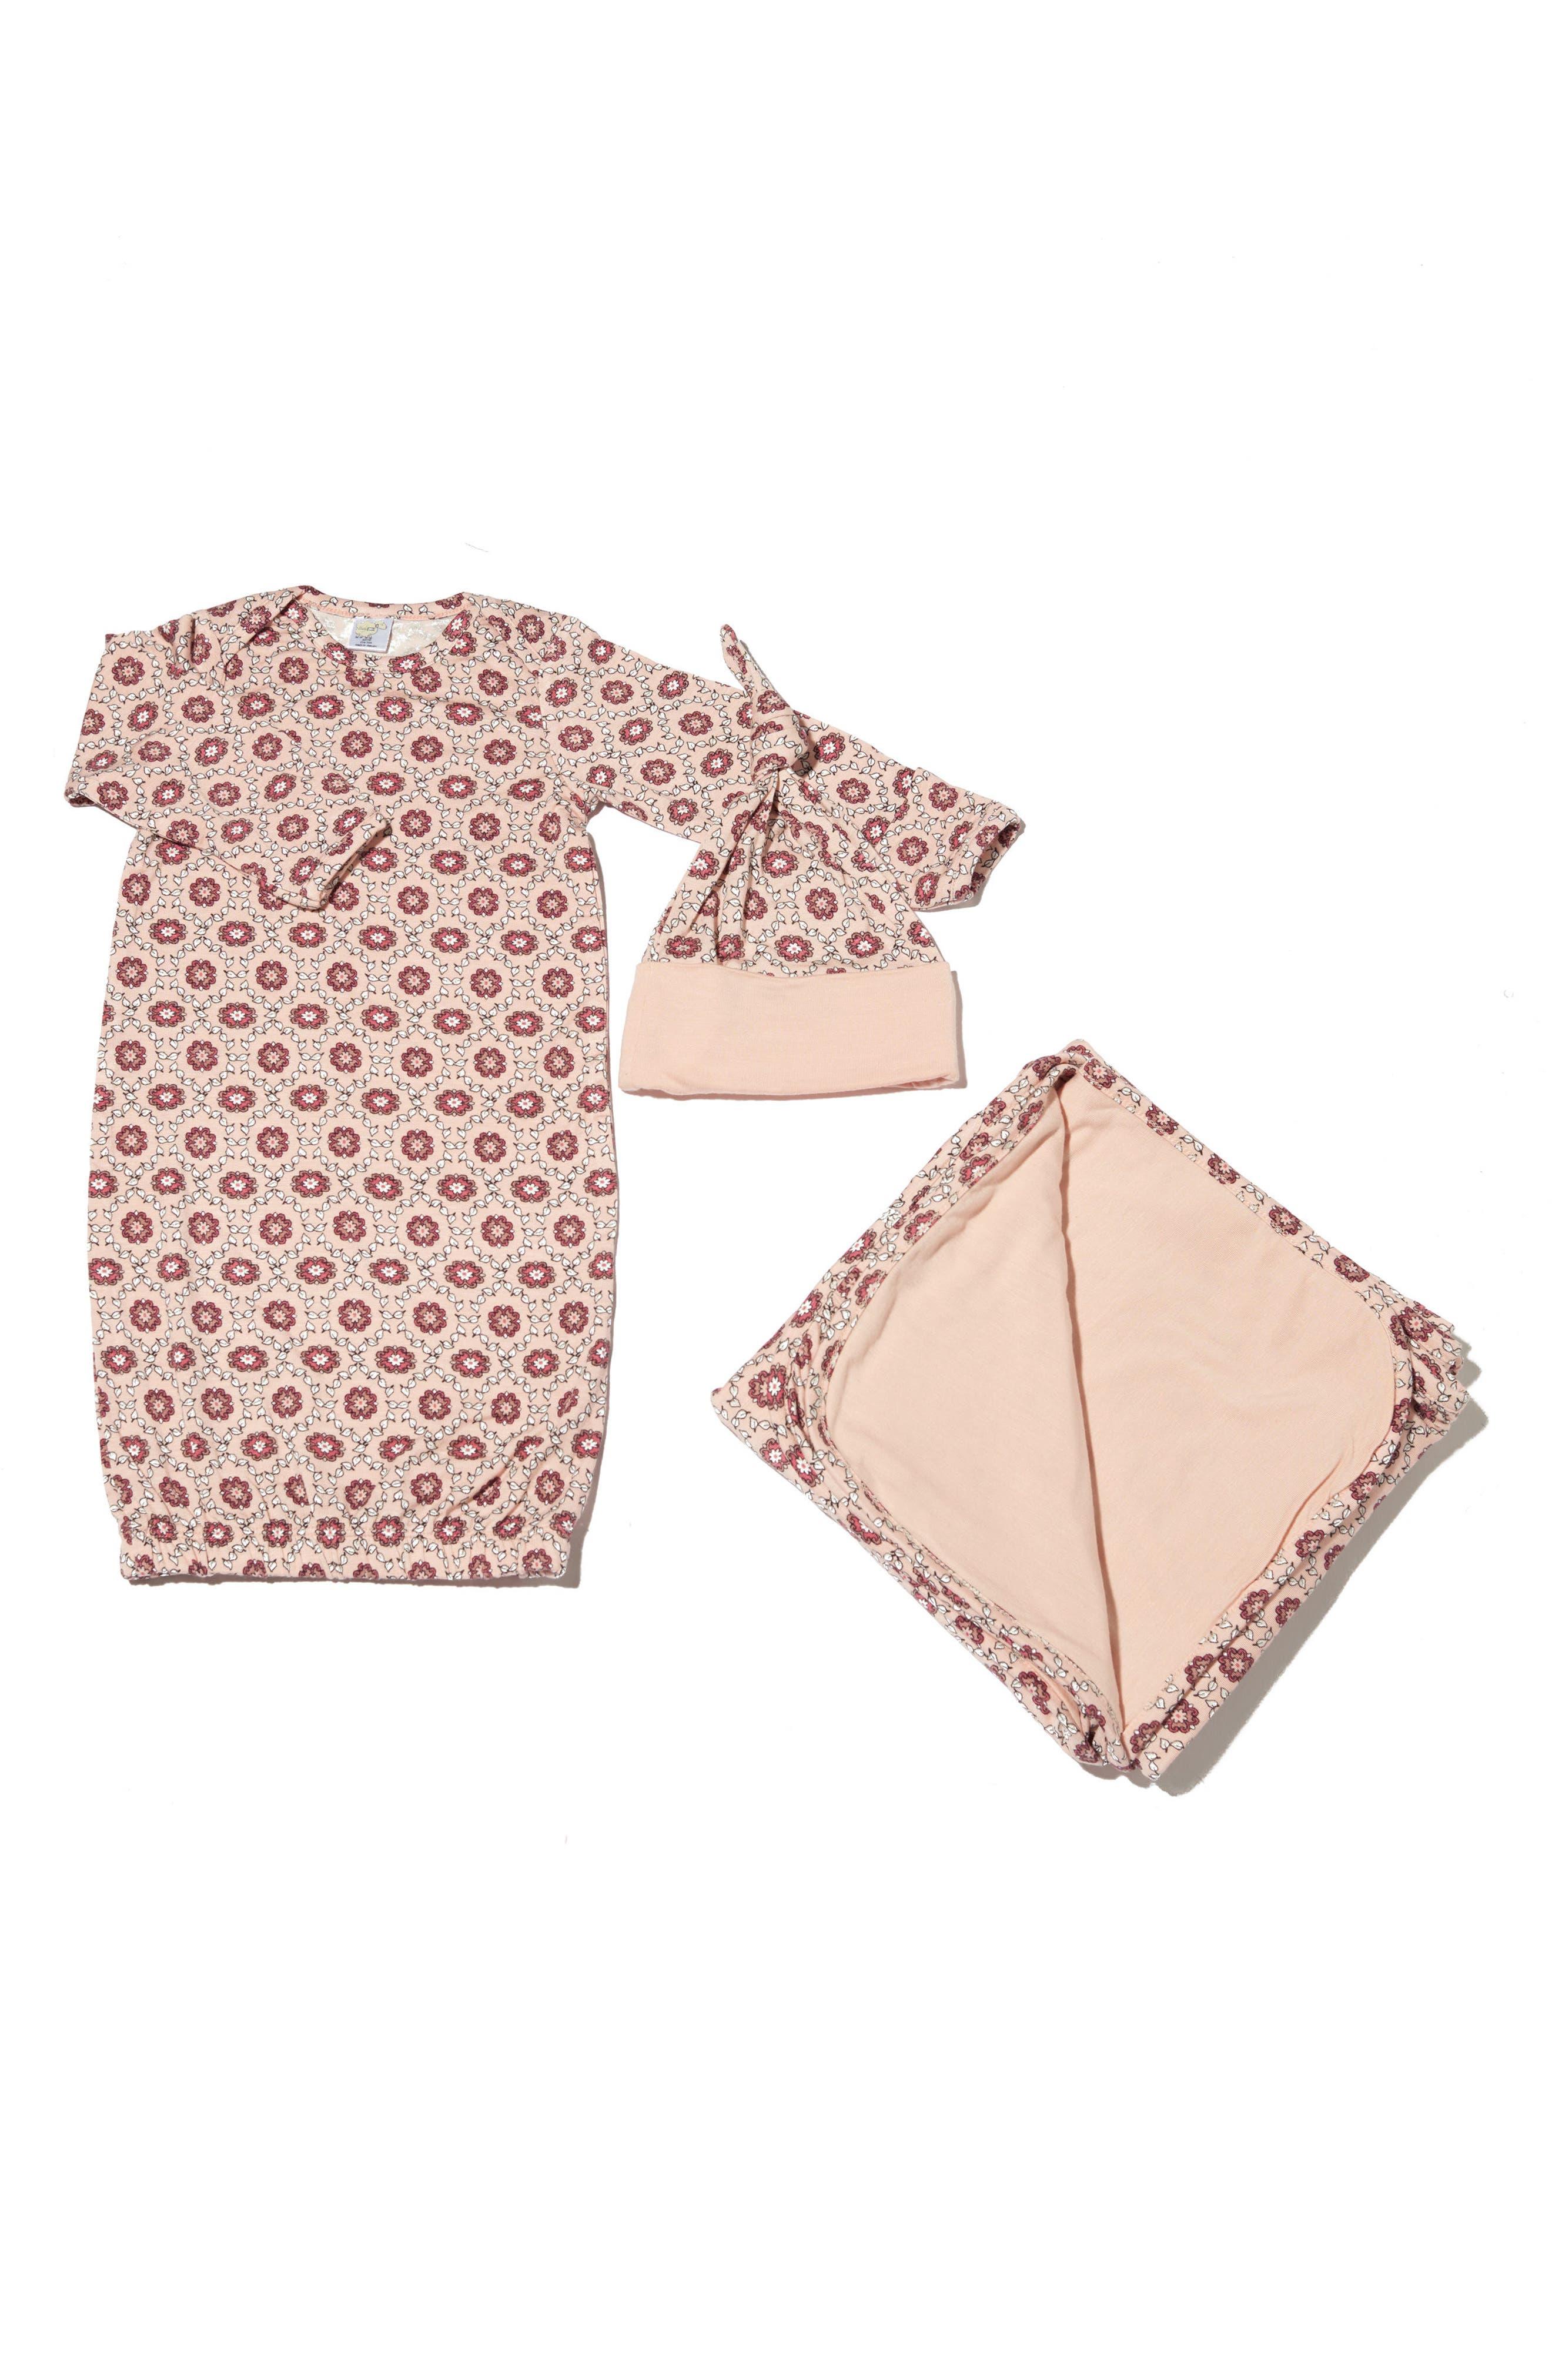 Print Gown, Hat & Blanket Set,                         Main,                         color, Blush Pink